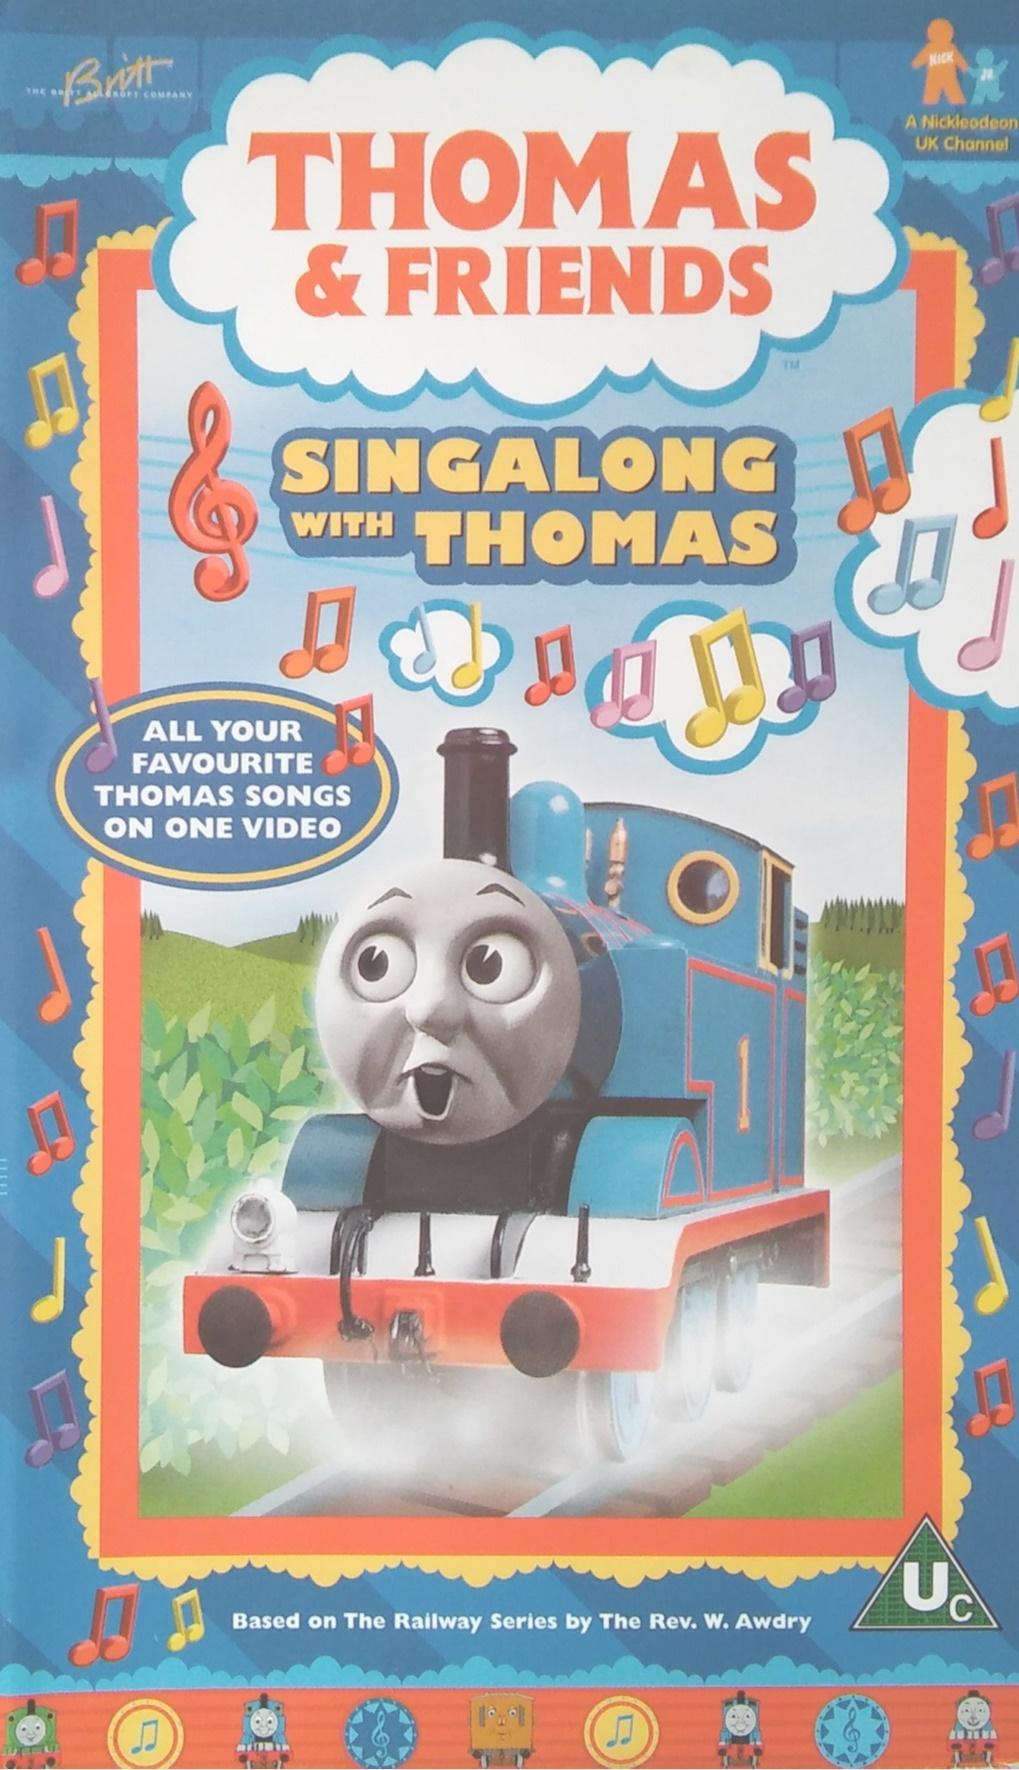 Singalong with Thomas